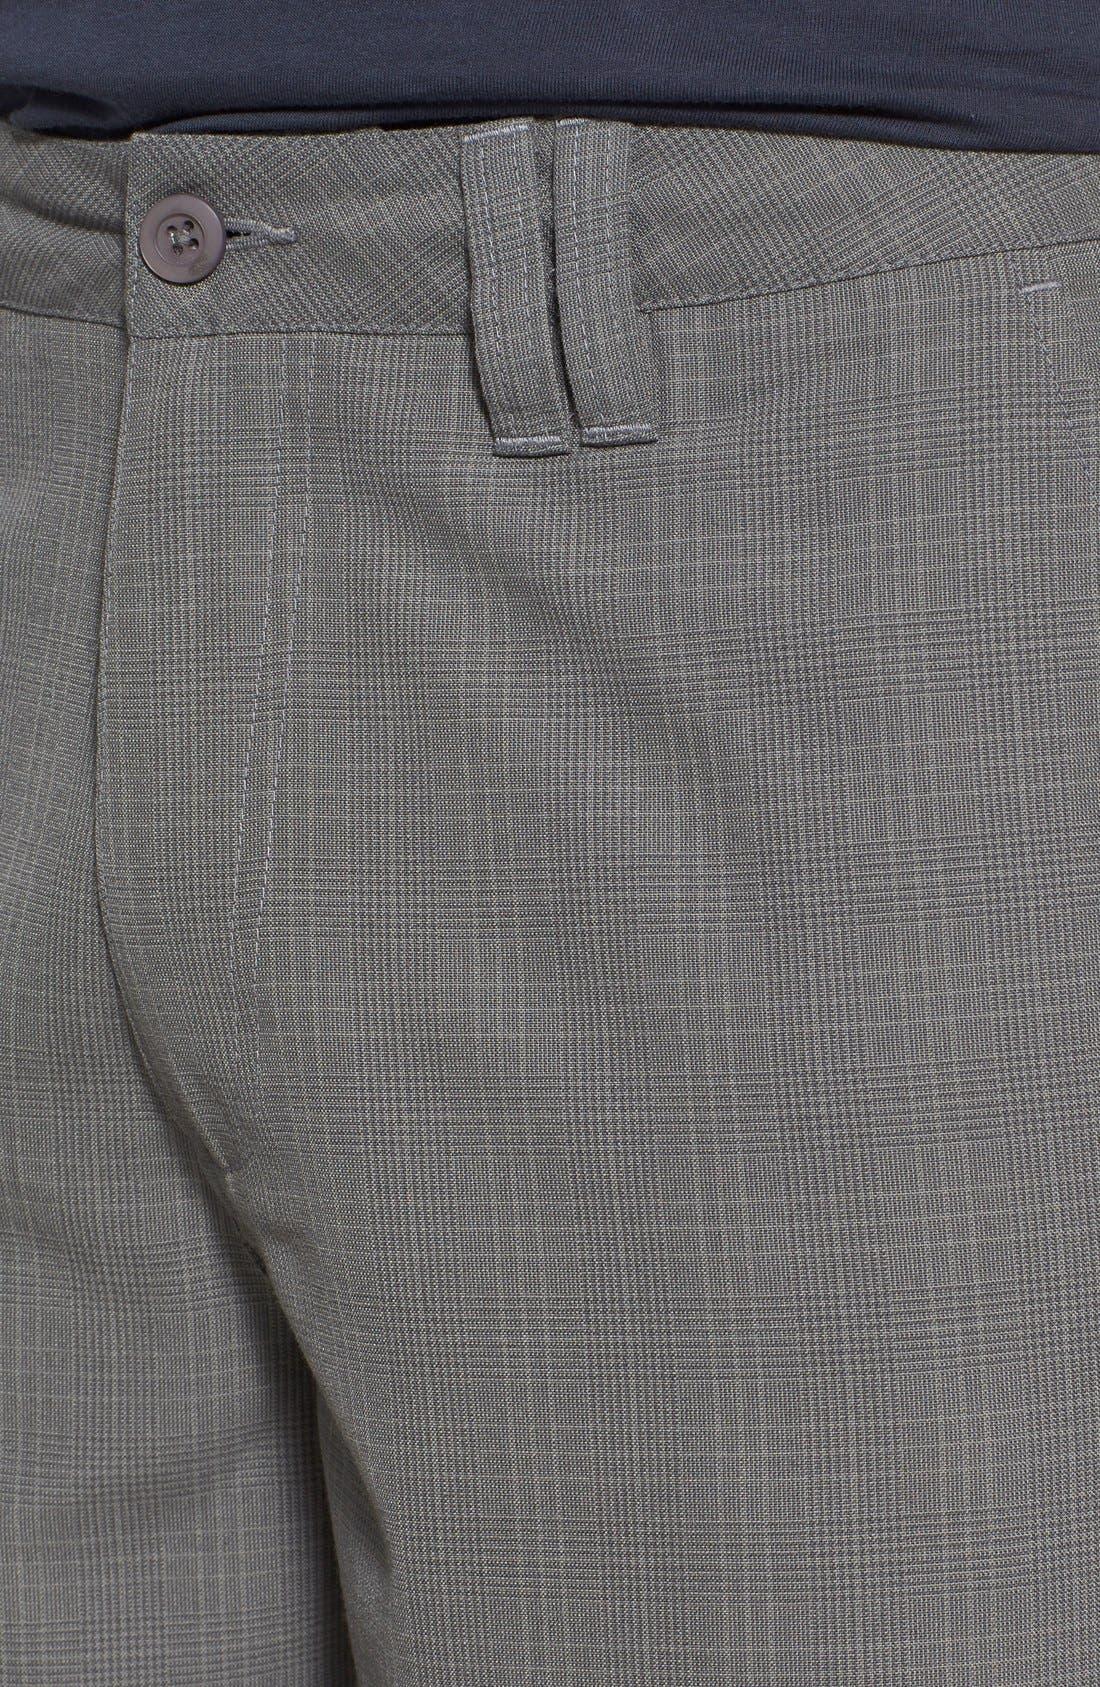 'Delta Plaid' Chino Shorts,                             Alternate thumbnail 12, color,